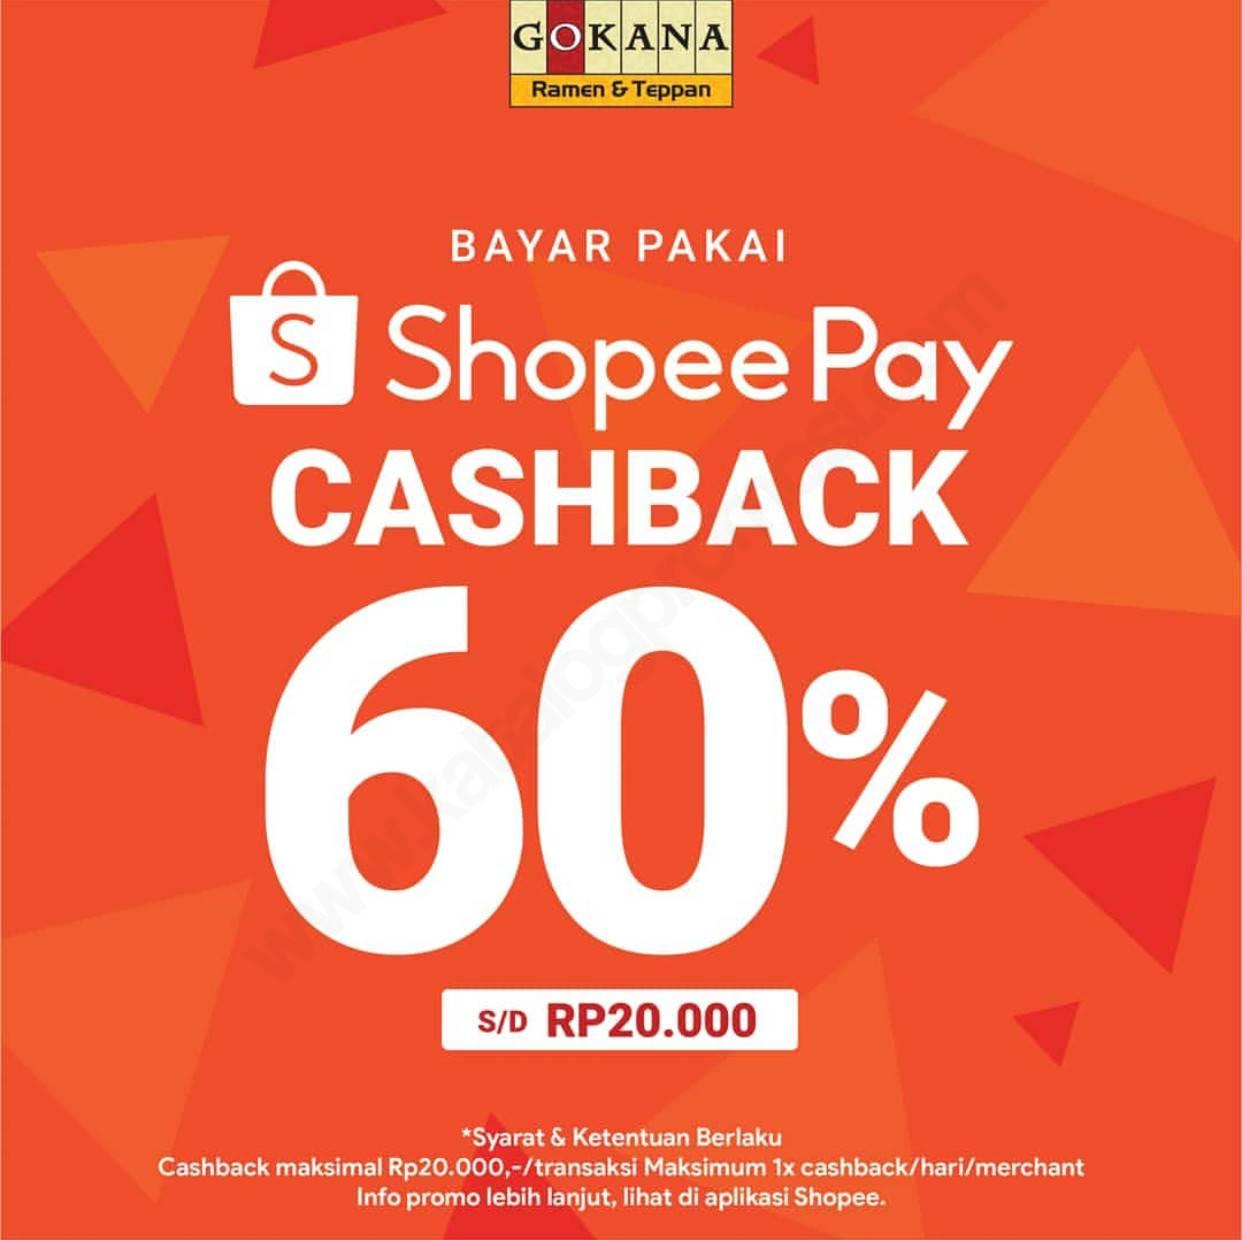 Gokana Cashback 60% dengan ShopeePay